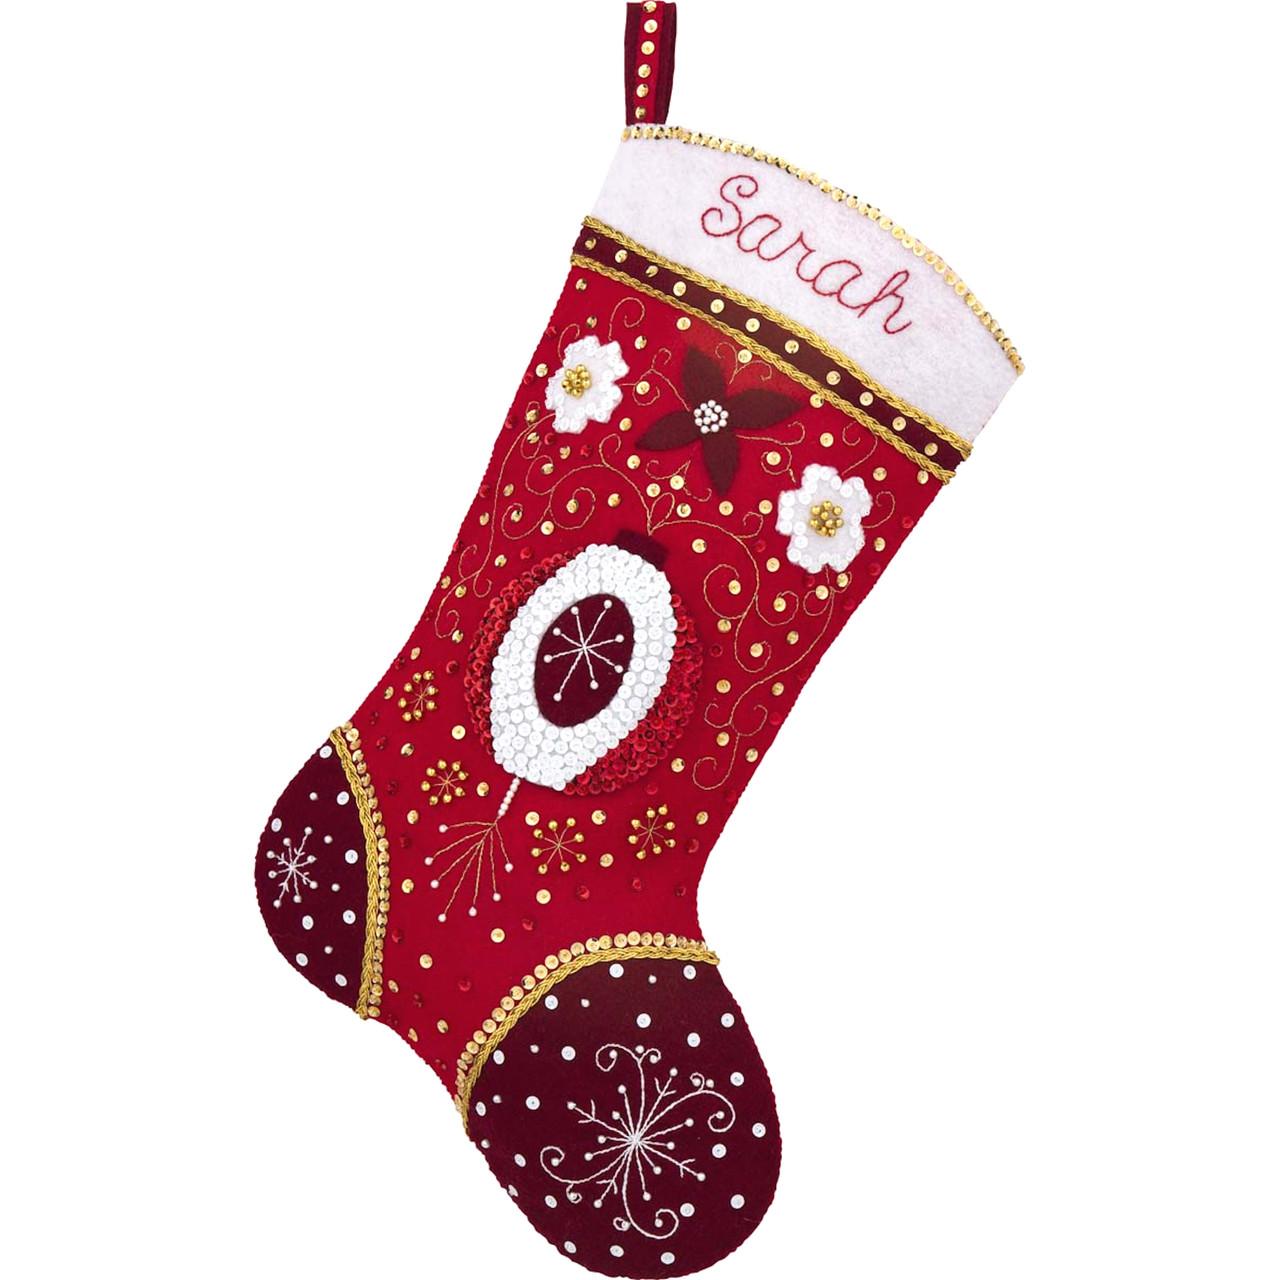 Plaid / Bucilla - Holiday Elegance Christmas Stocking